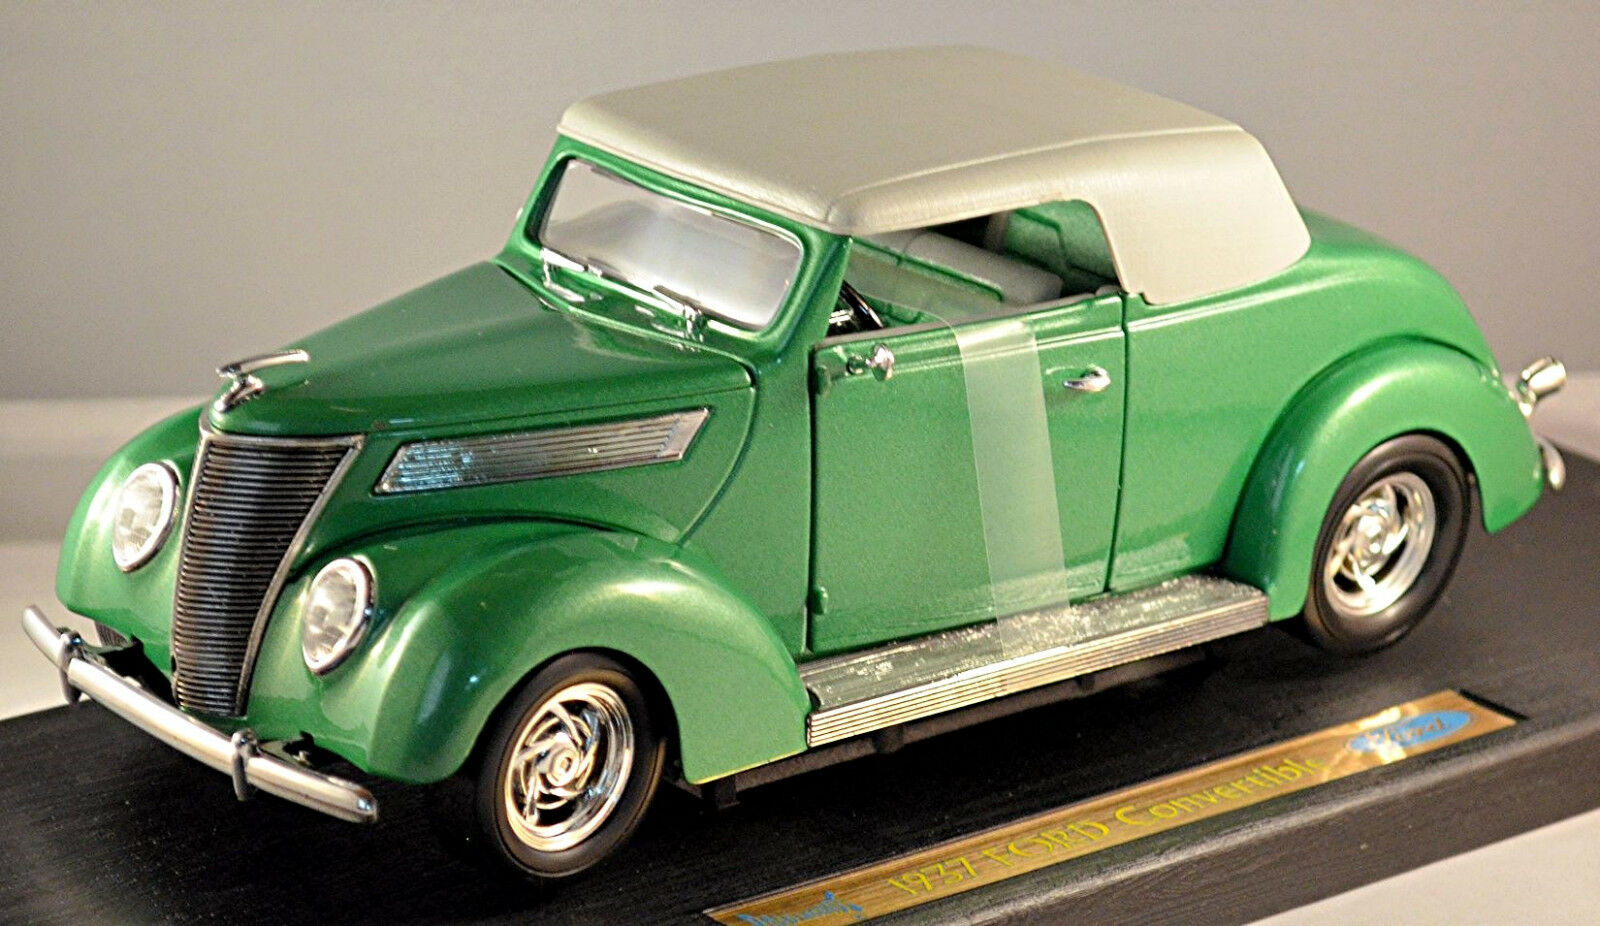 Ford De Luxe Converdeibile 1937 verde verde Metallizzato 1 18 Yat Ming